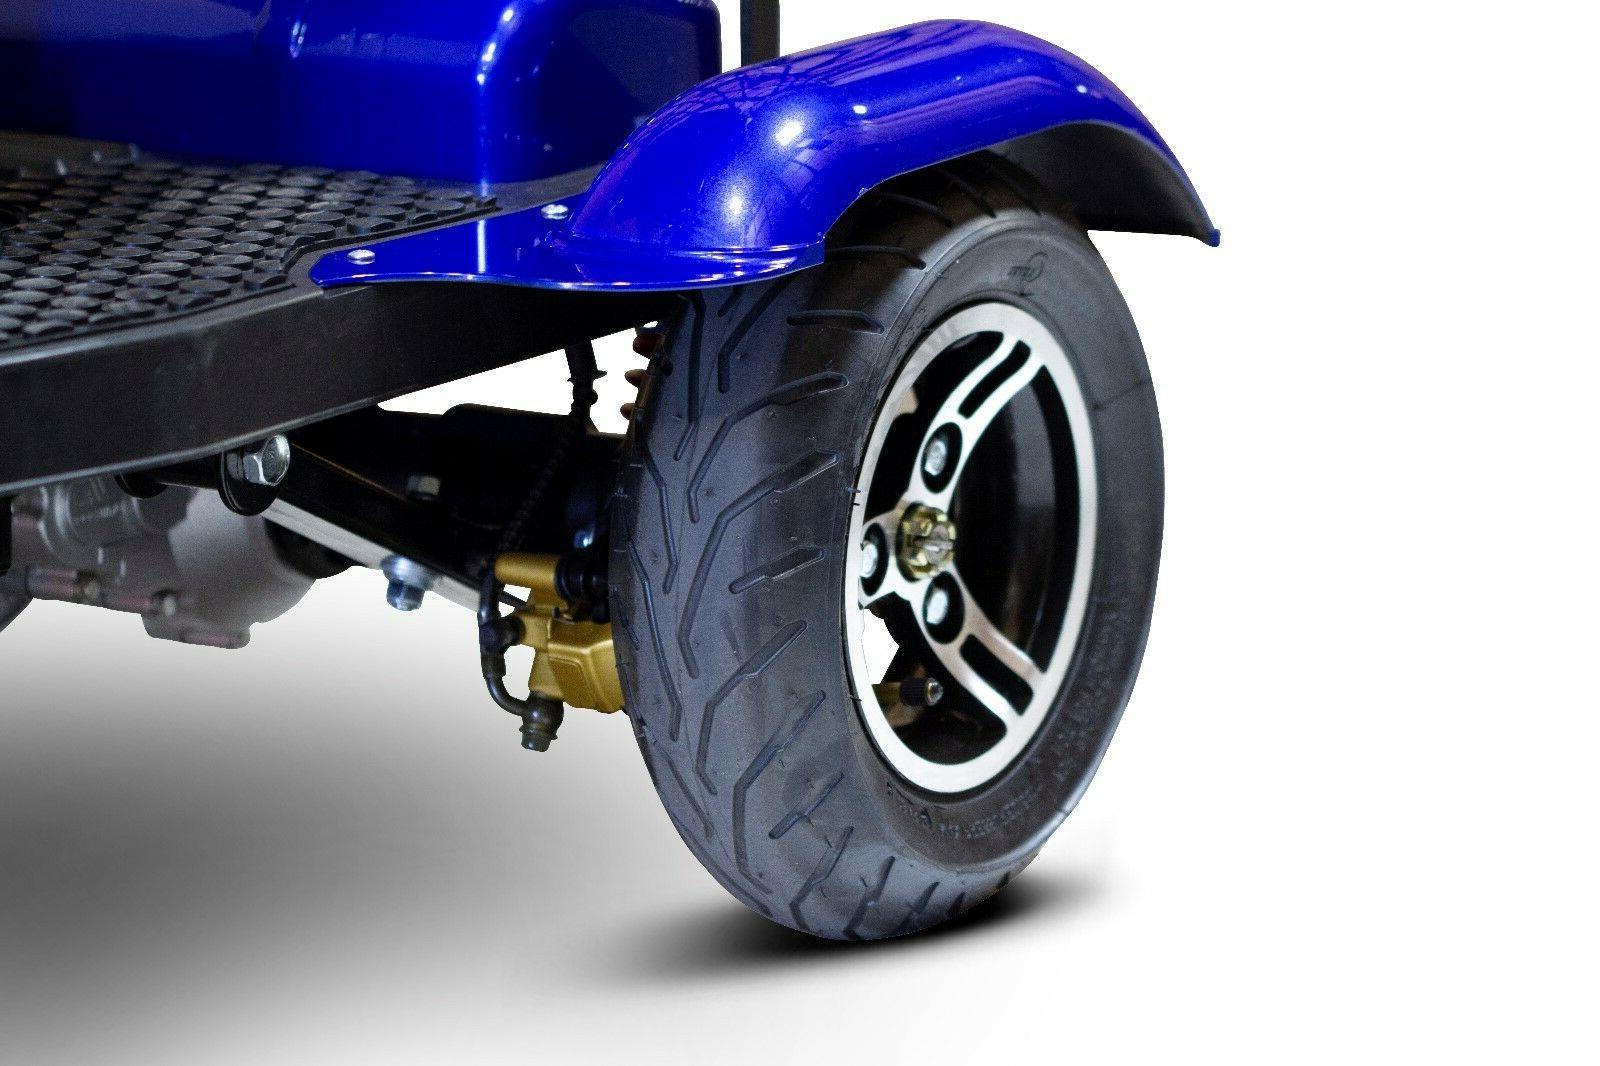 eWheels Blue Mobility Loaded, NOTAX